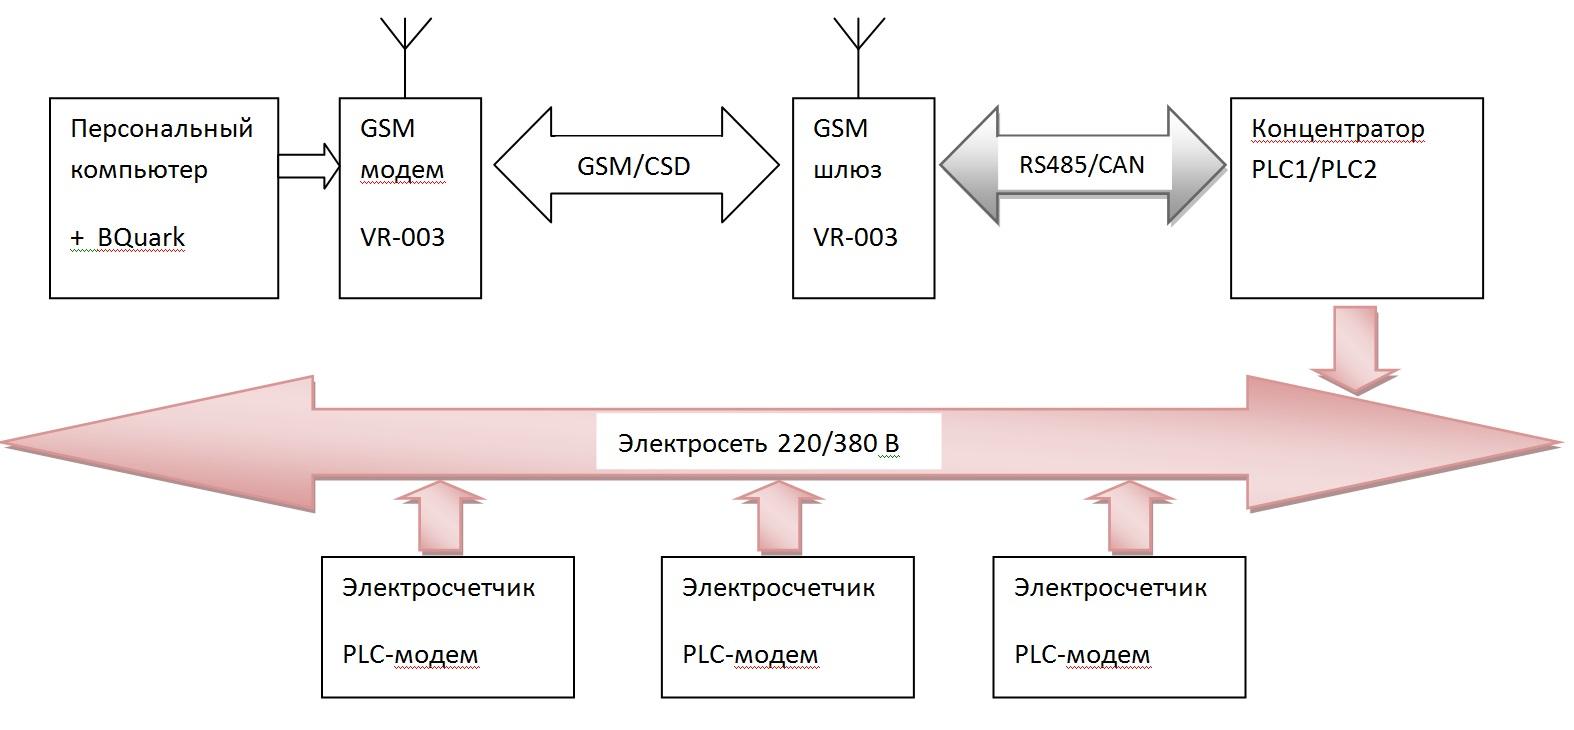 схема подключения plc модема